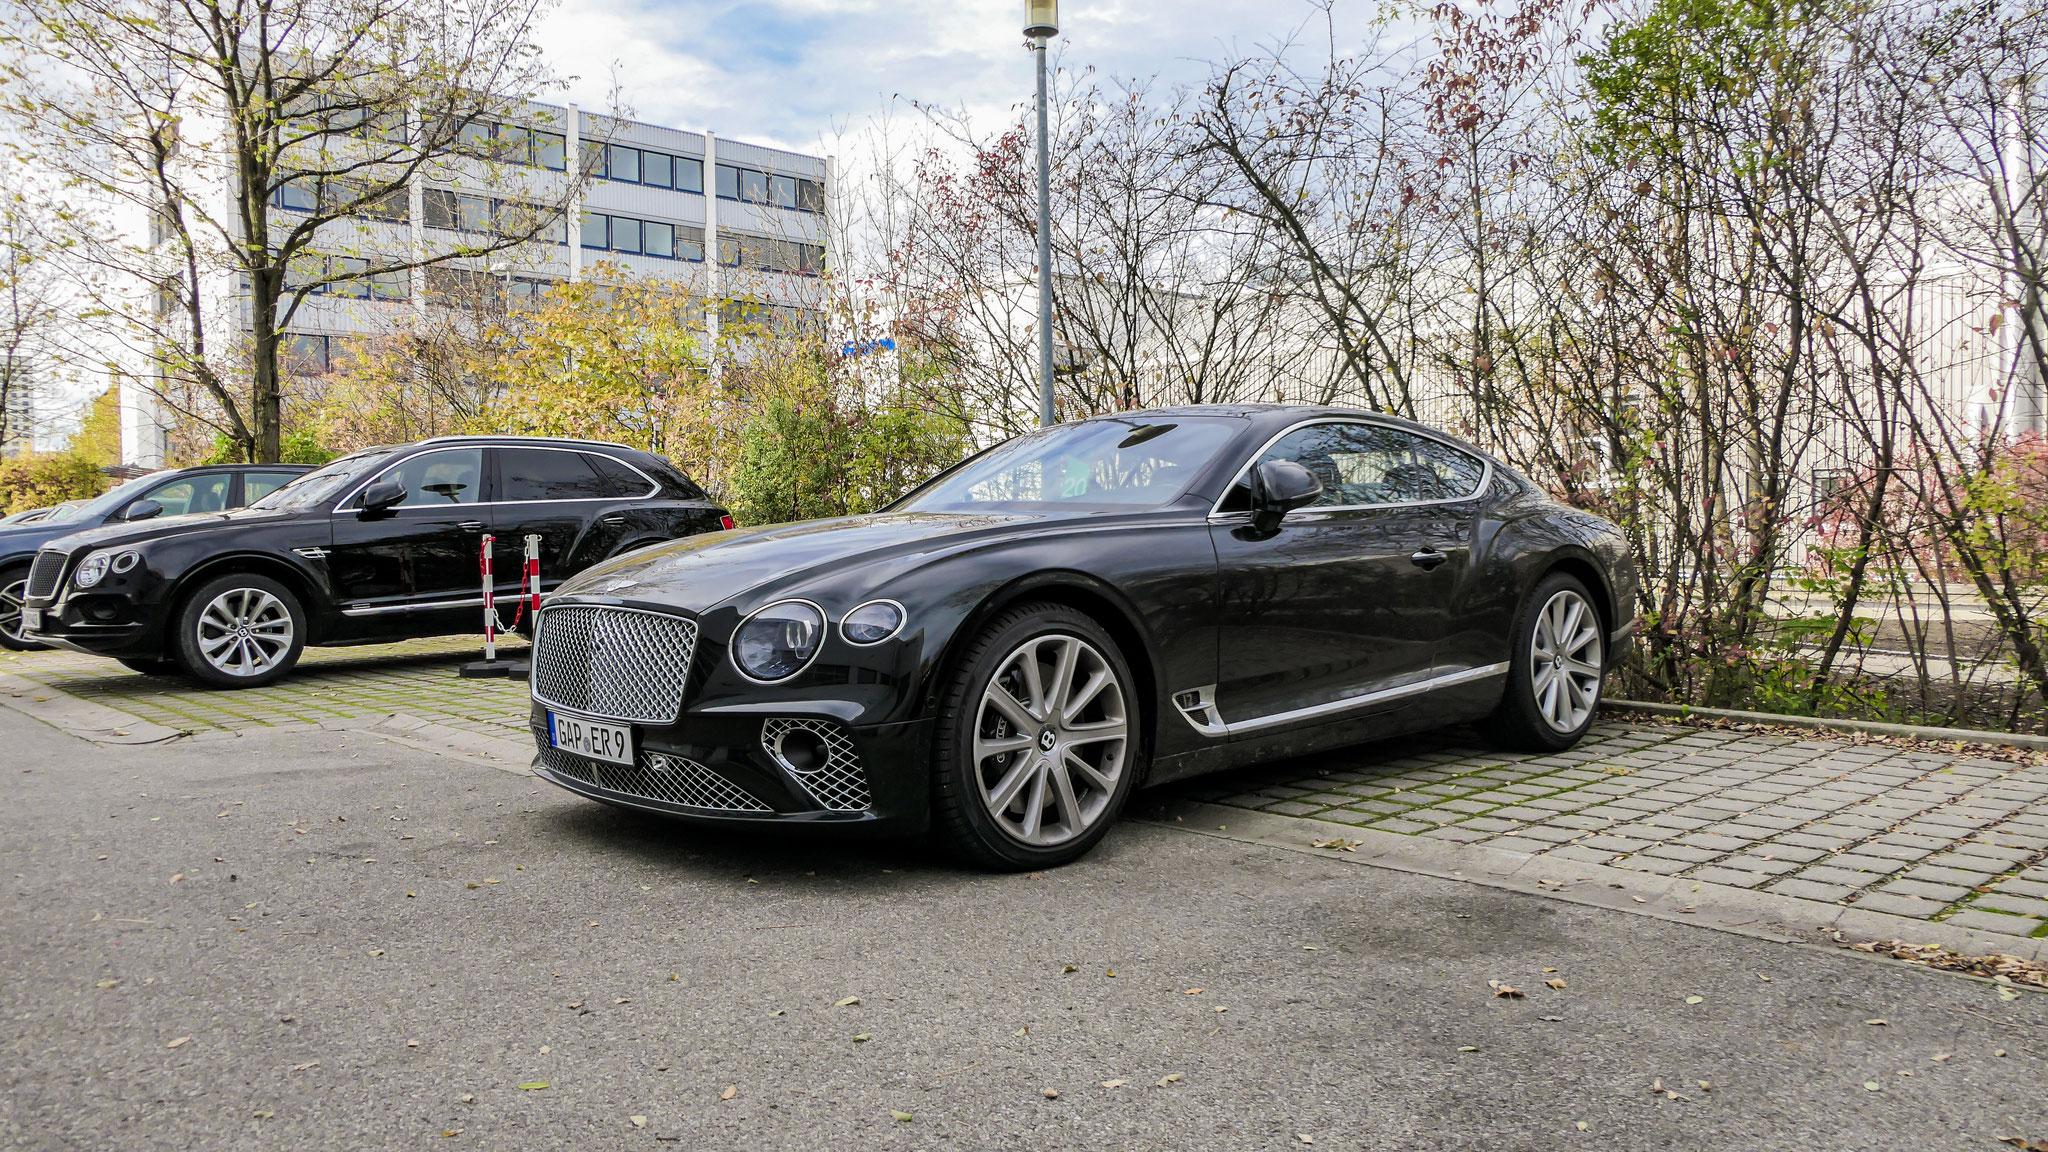 Bentley Continental GT - GAP-ER-9